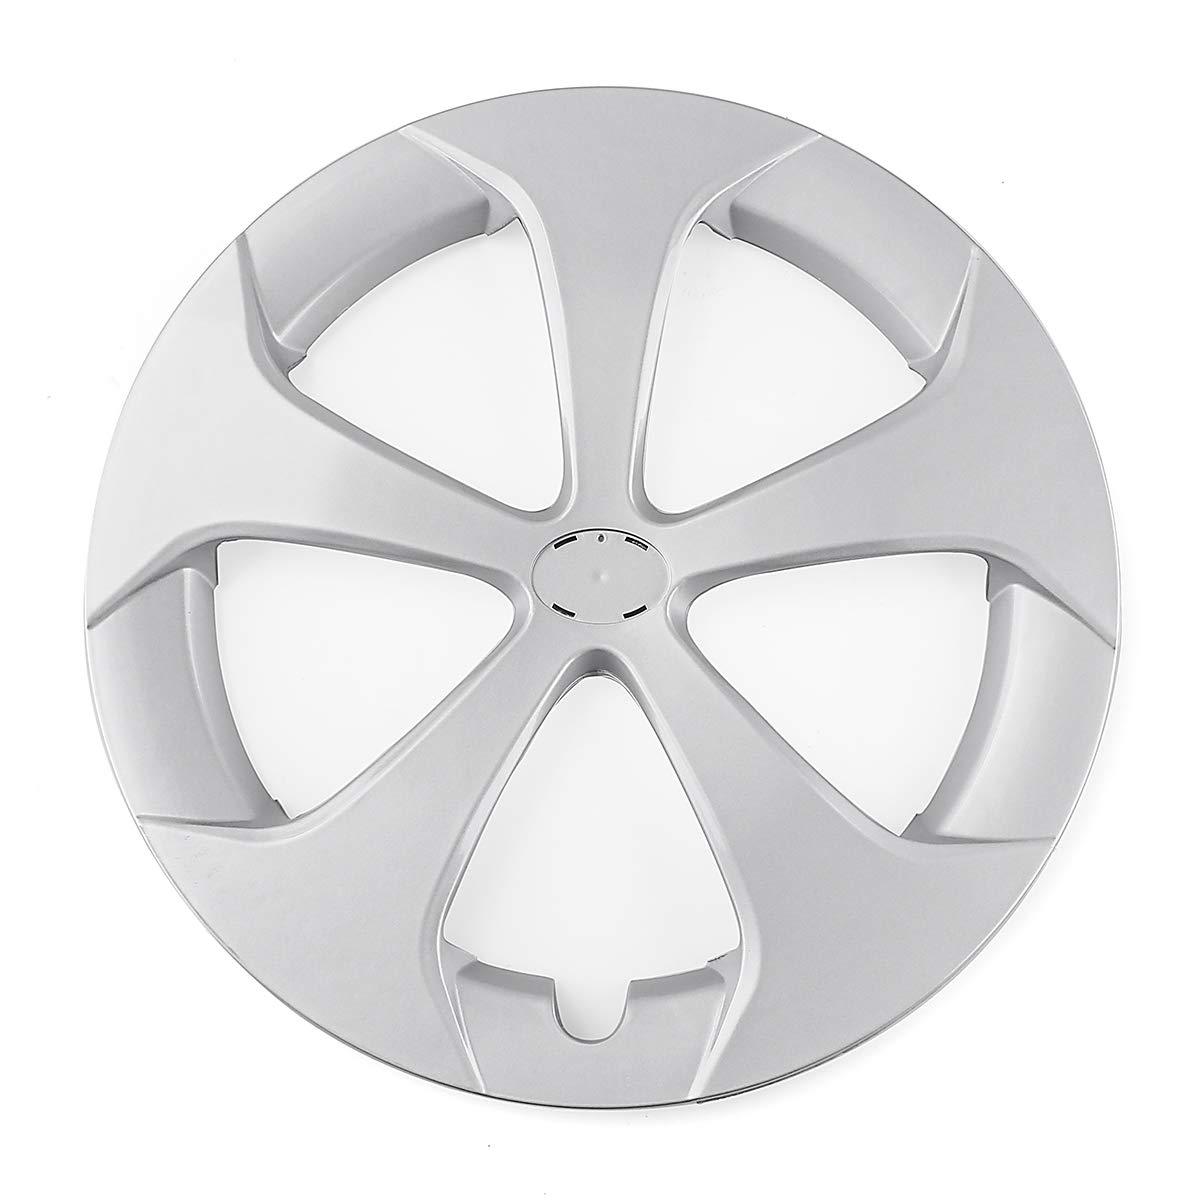 YONGYAO 40.8Cm Silver Plastic Car Wheel Tire Cover For Toyota Prius//Prius C 2012-2015